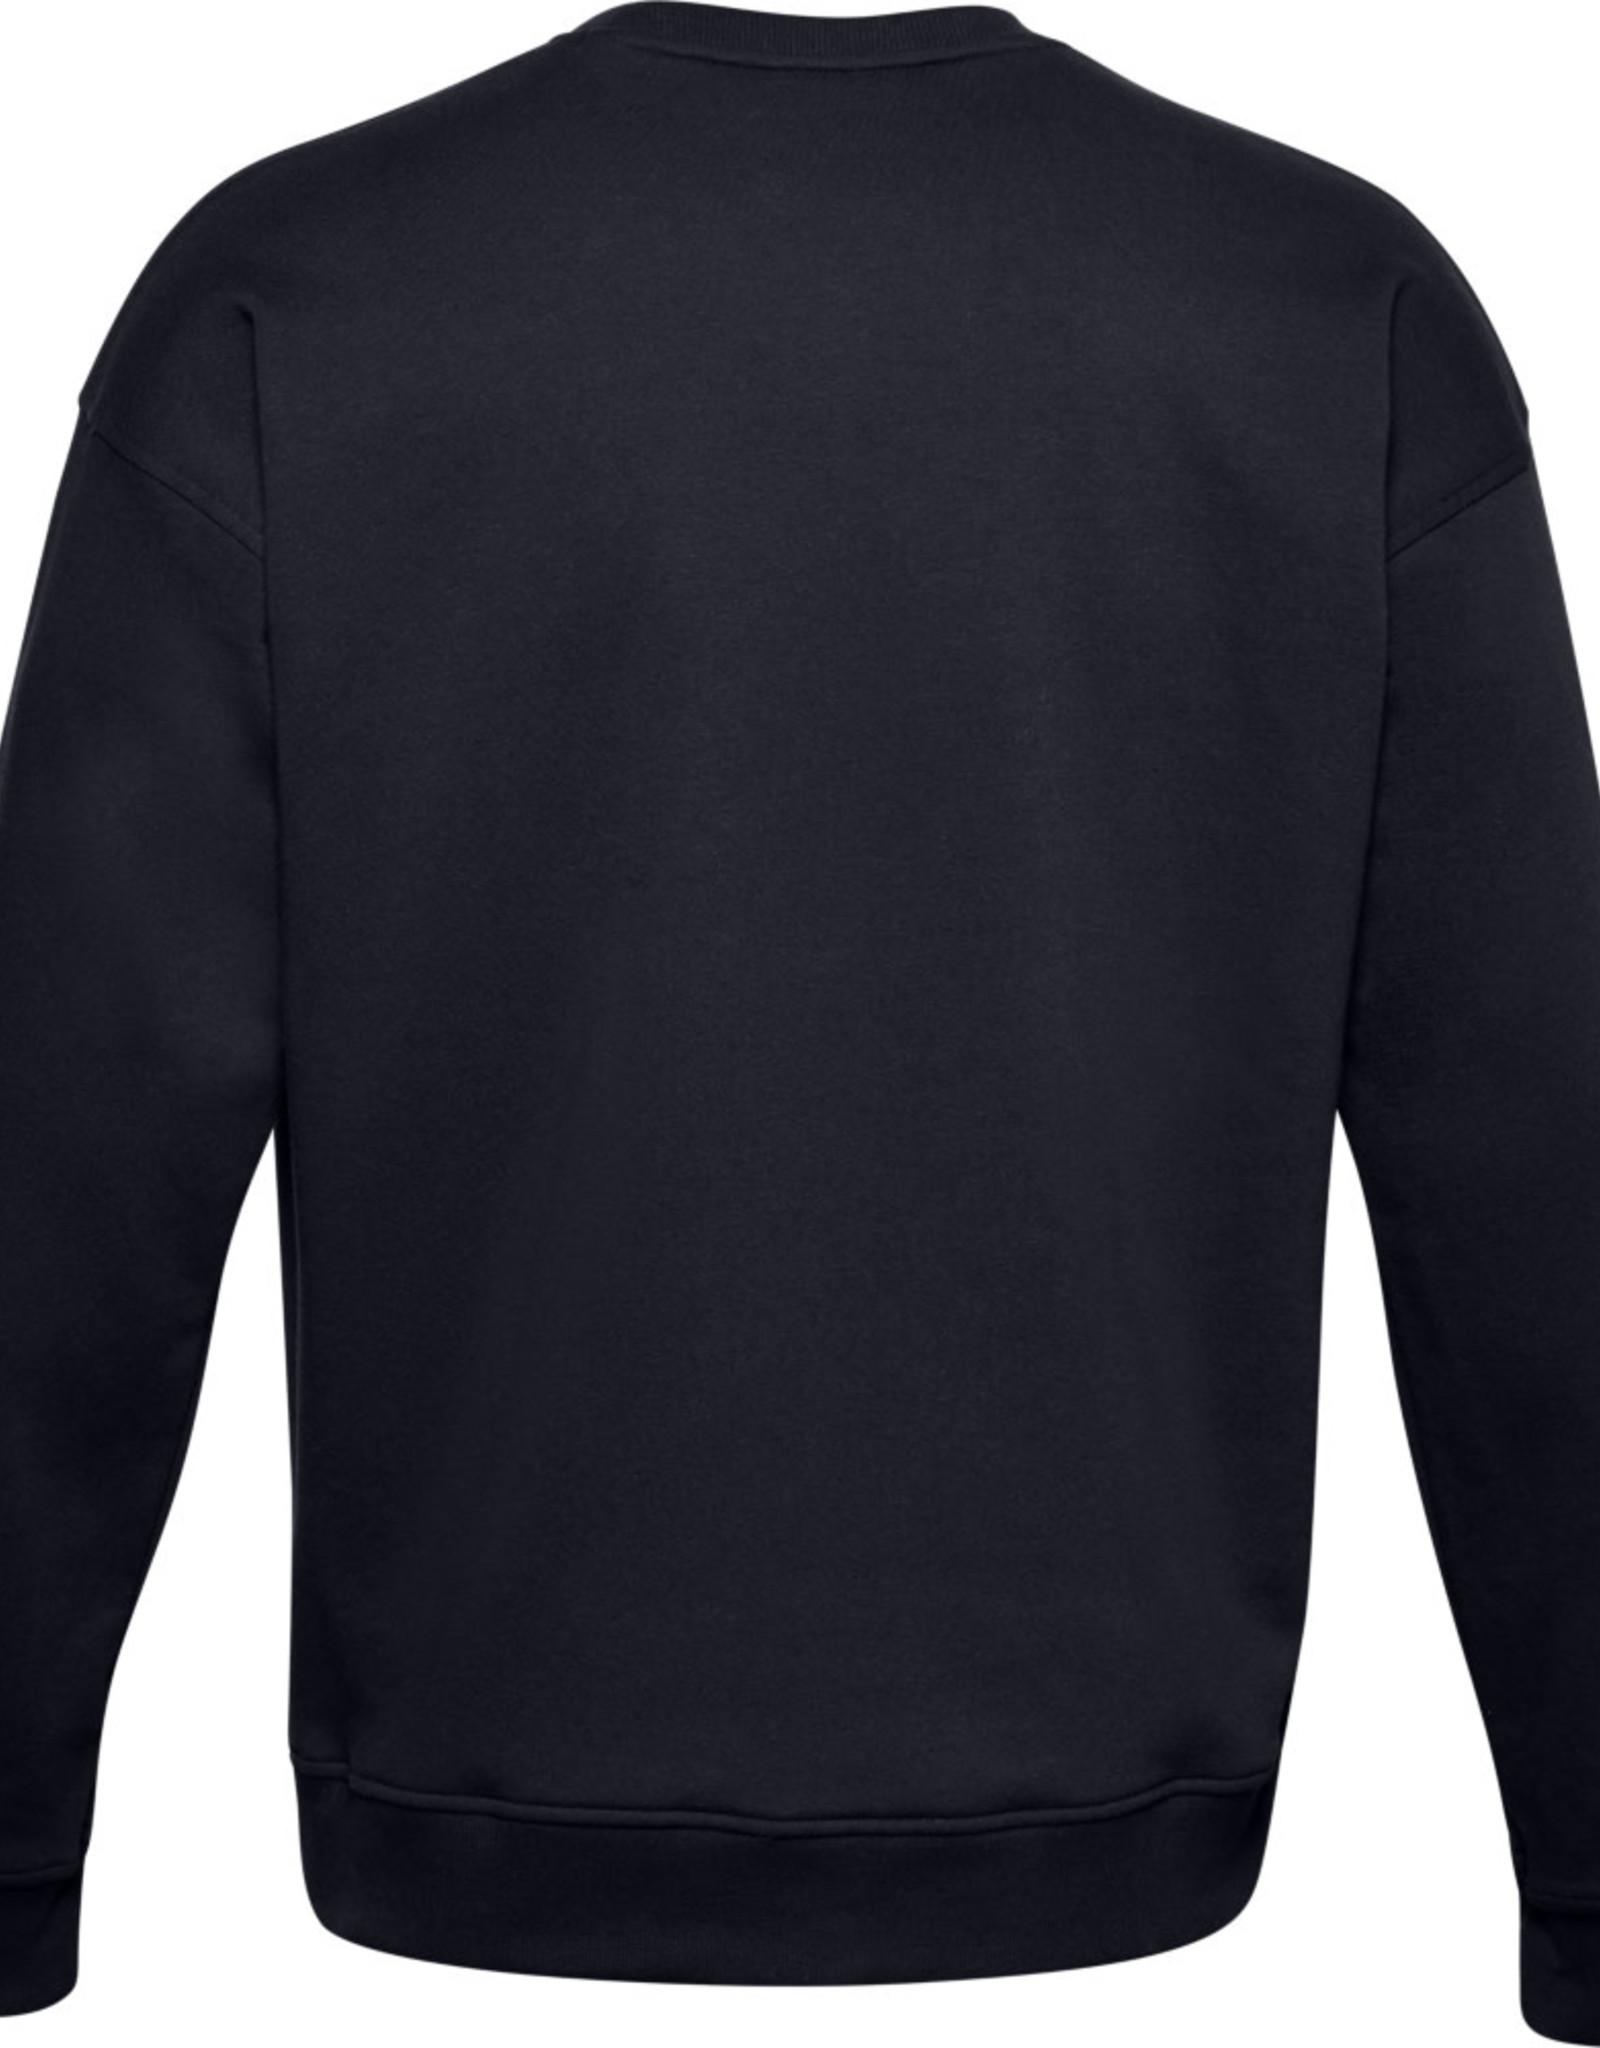 Under Armour UA Rival Fleece Camo WM Crew - Black--Black